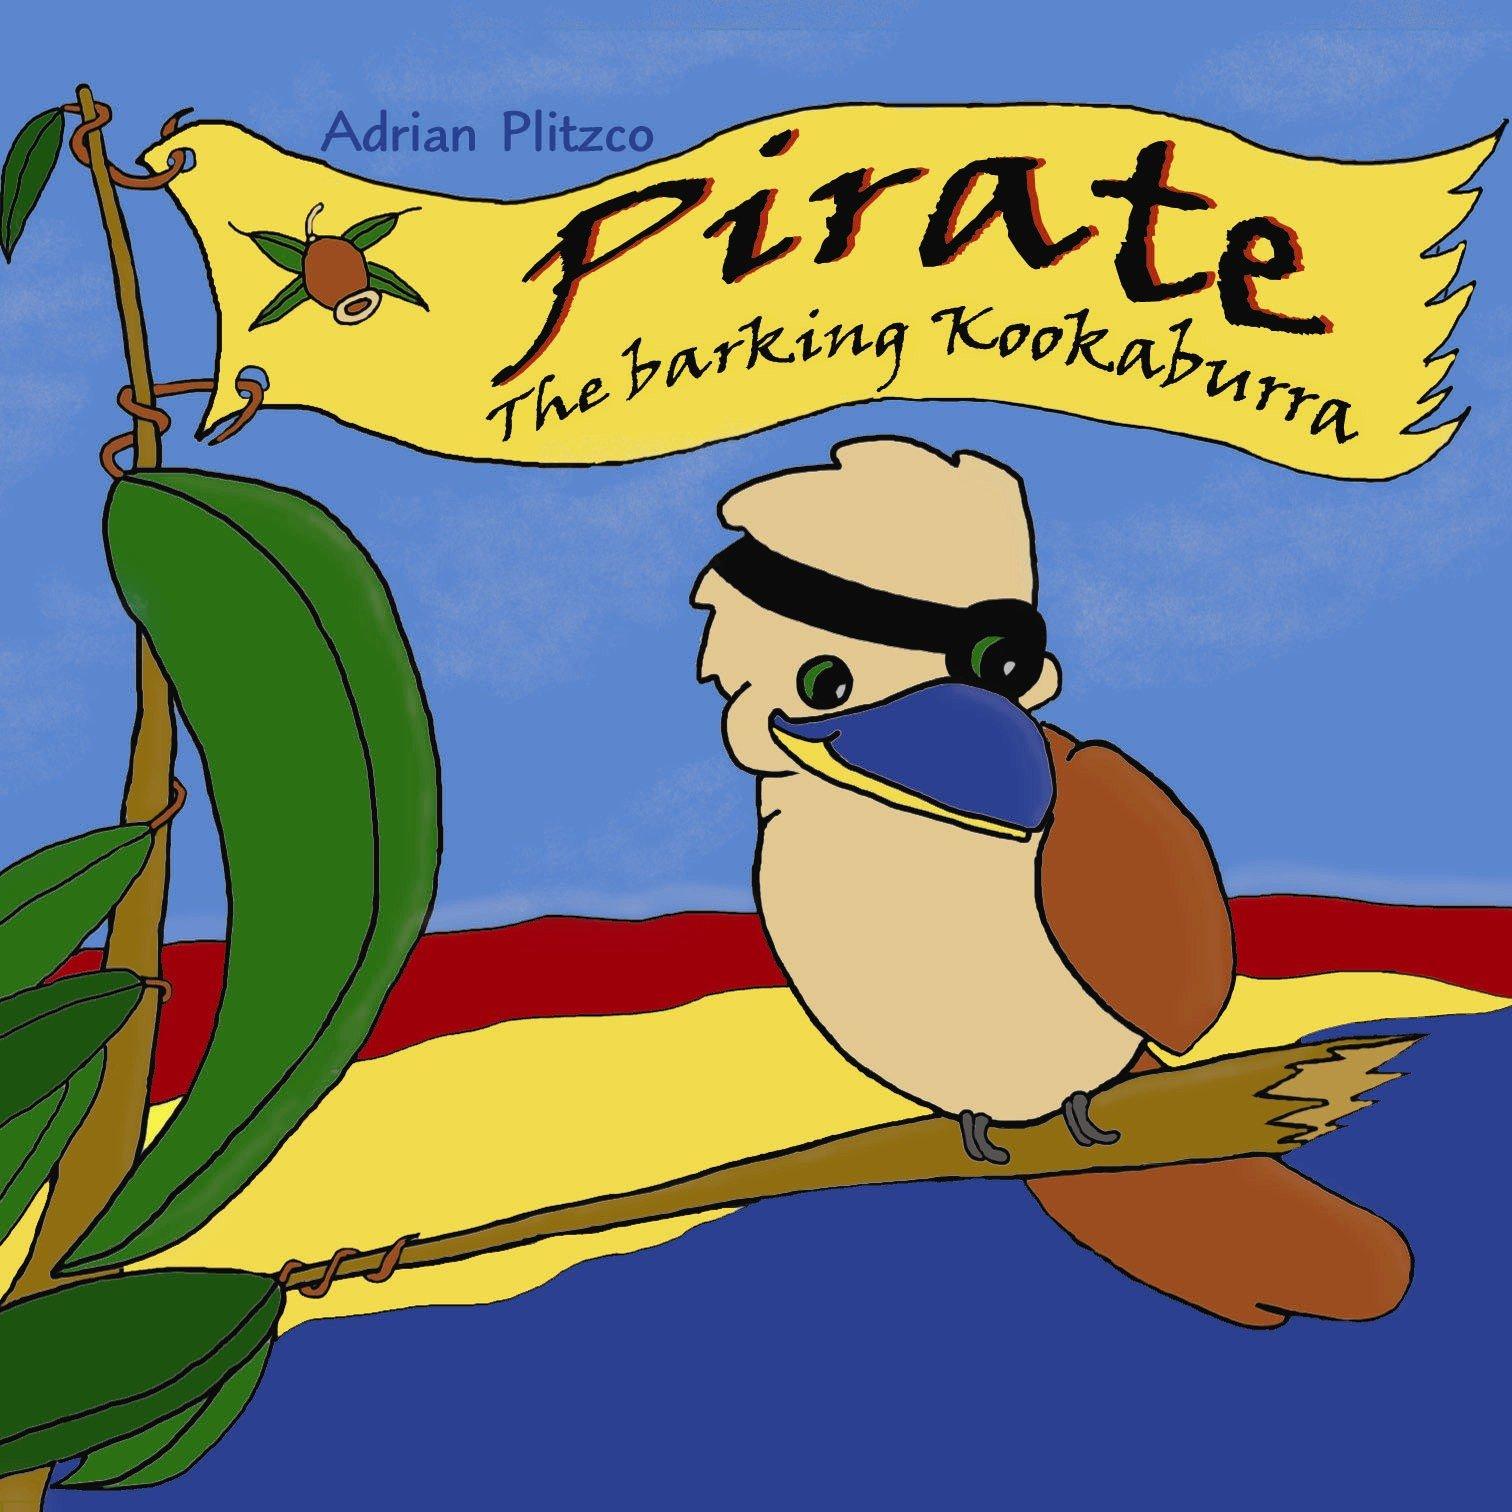 Pirate - The barking Kookaburra